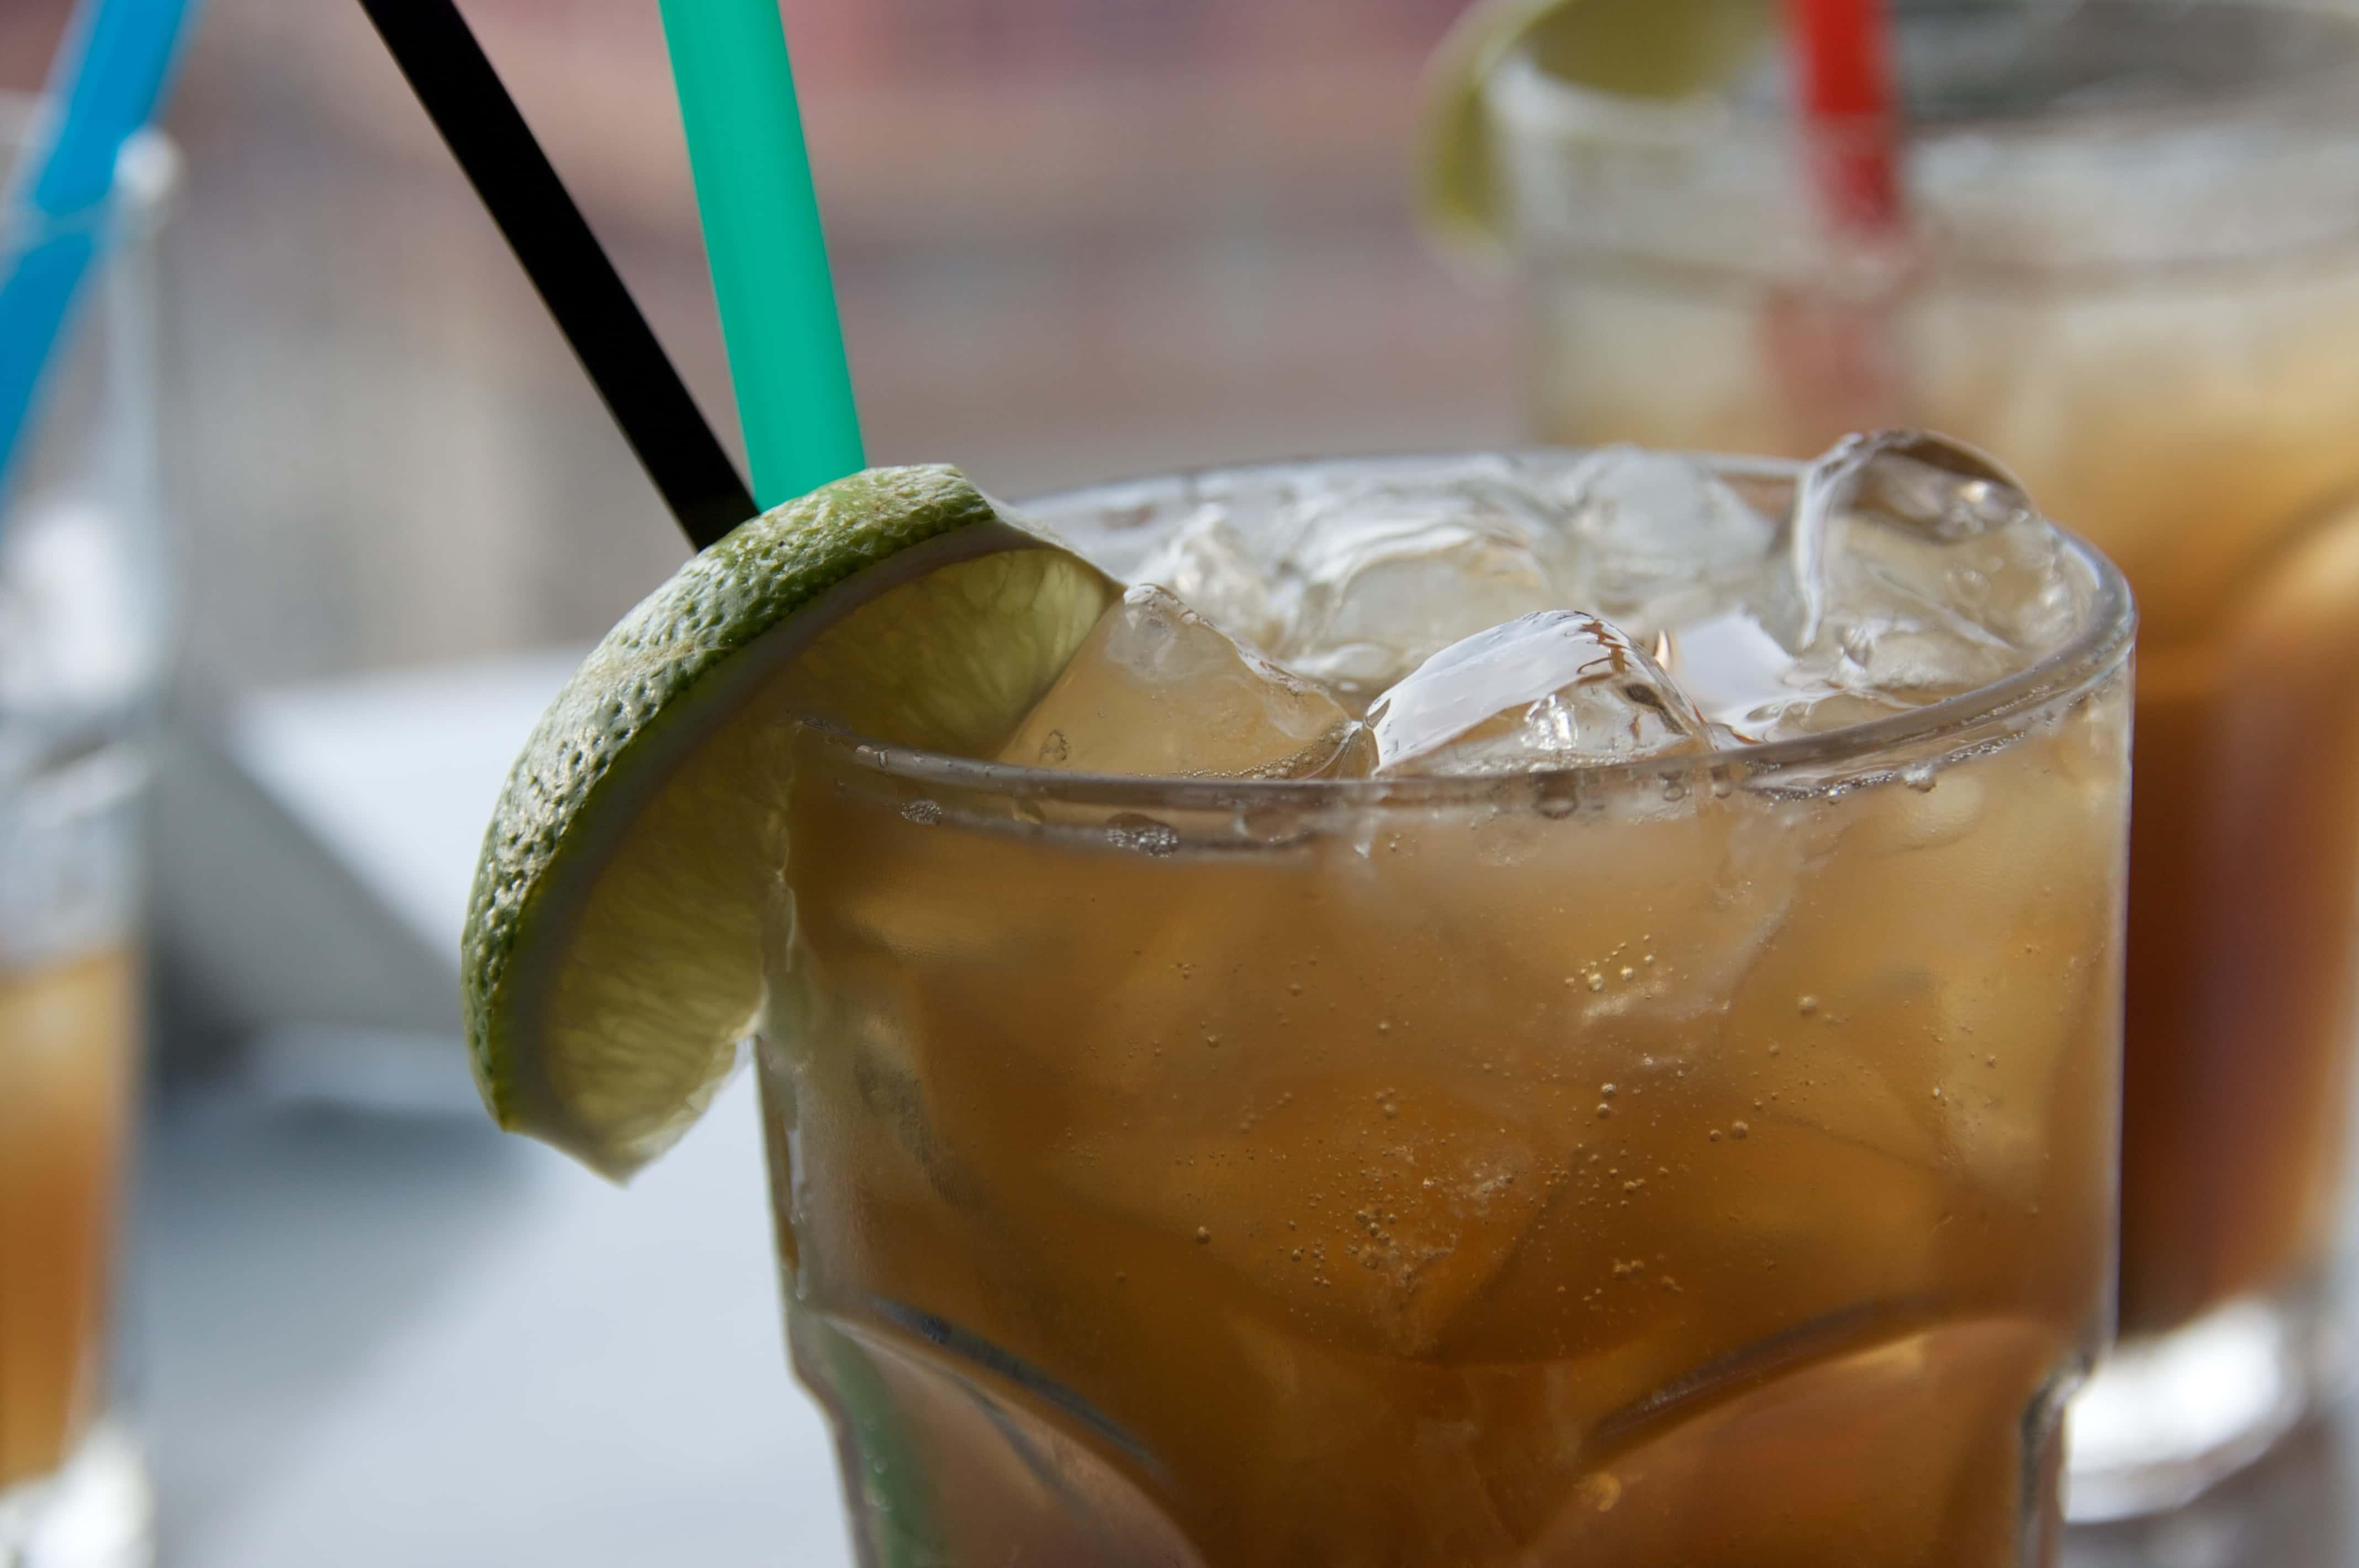 How Many Shots In A Long Island Iced Tea